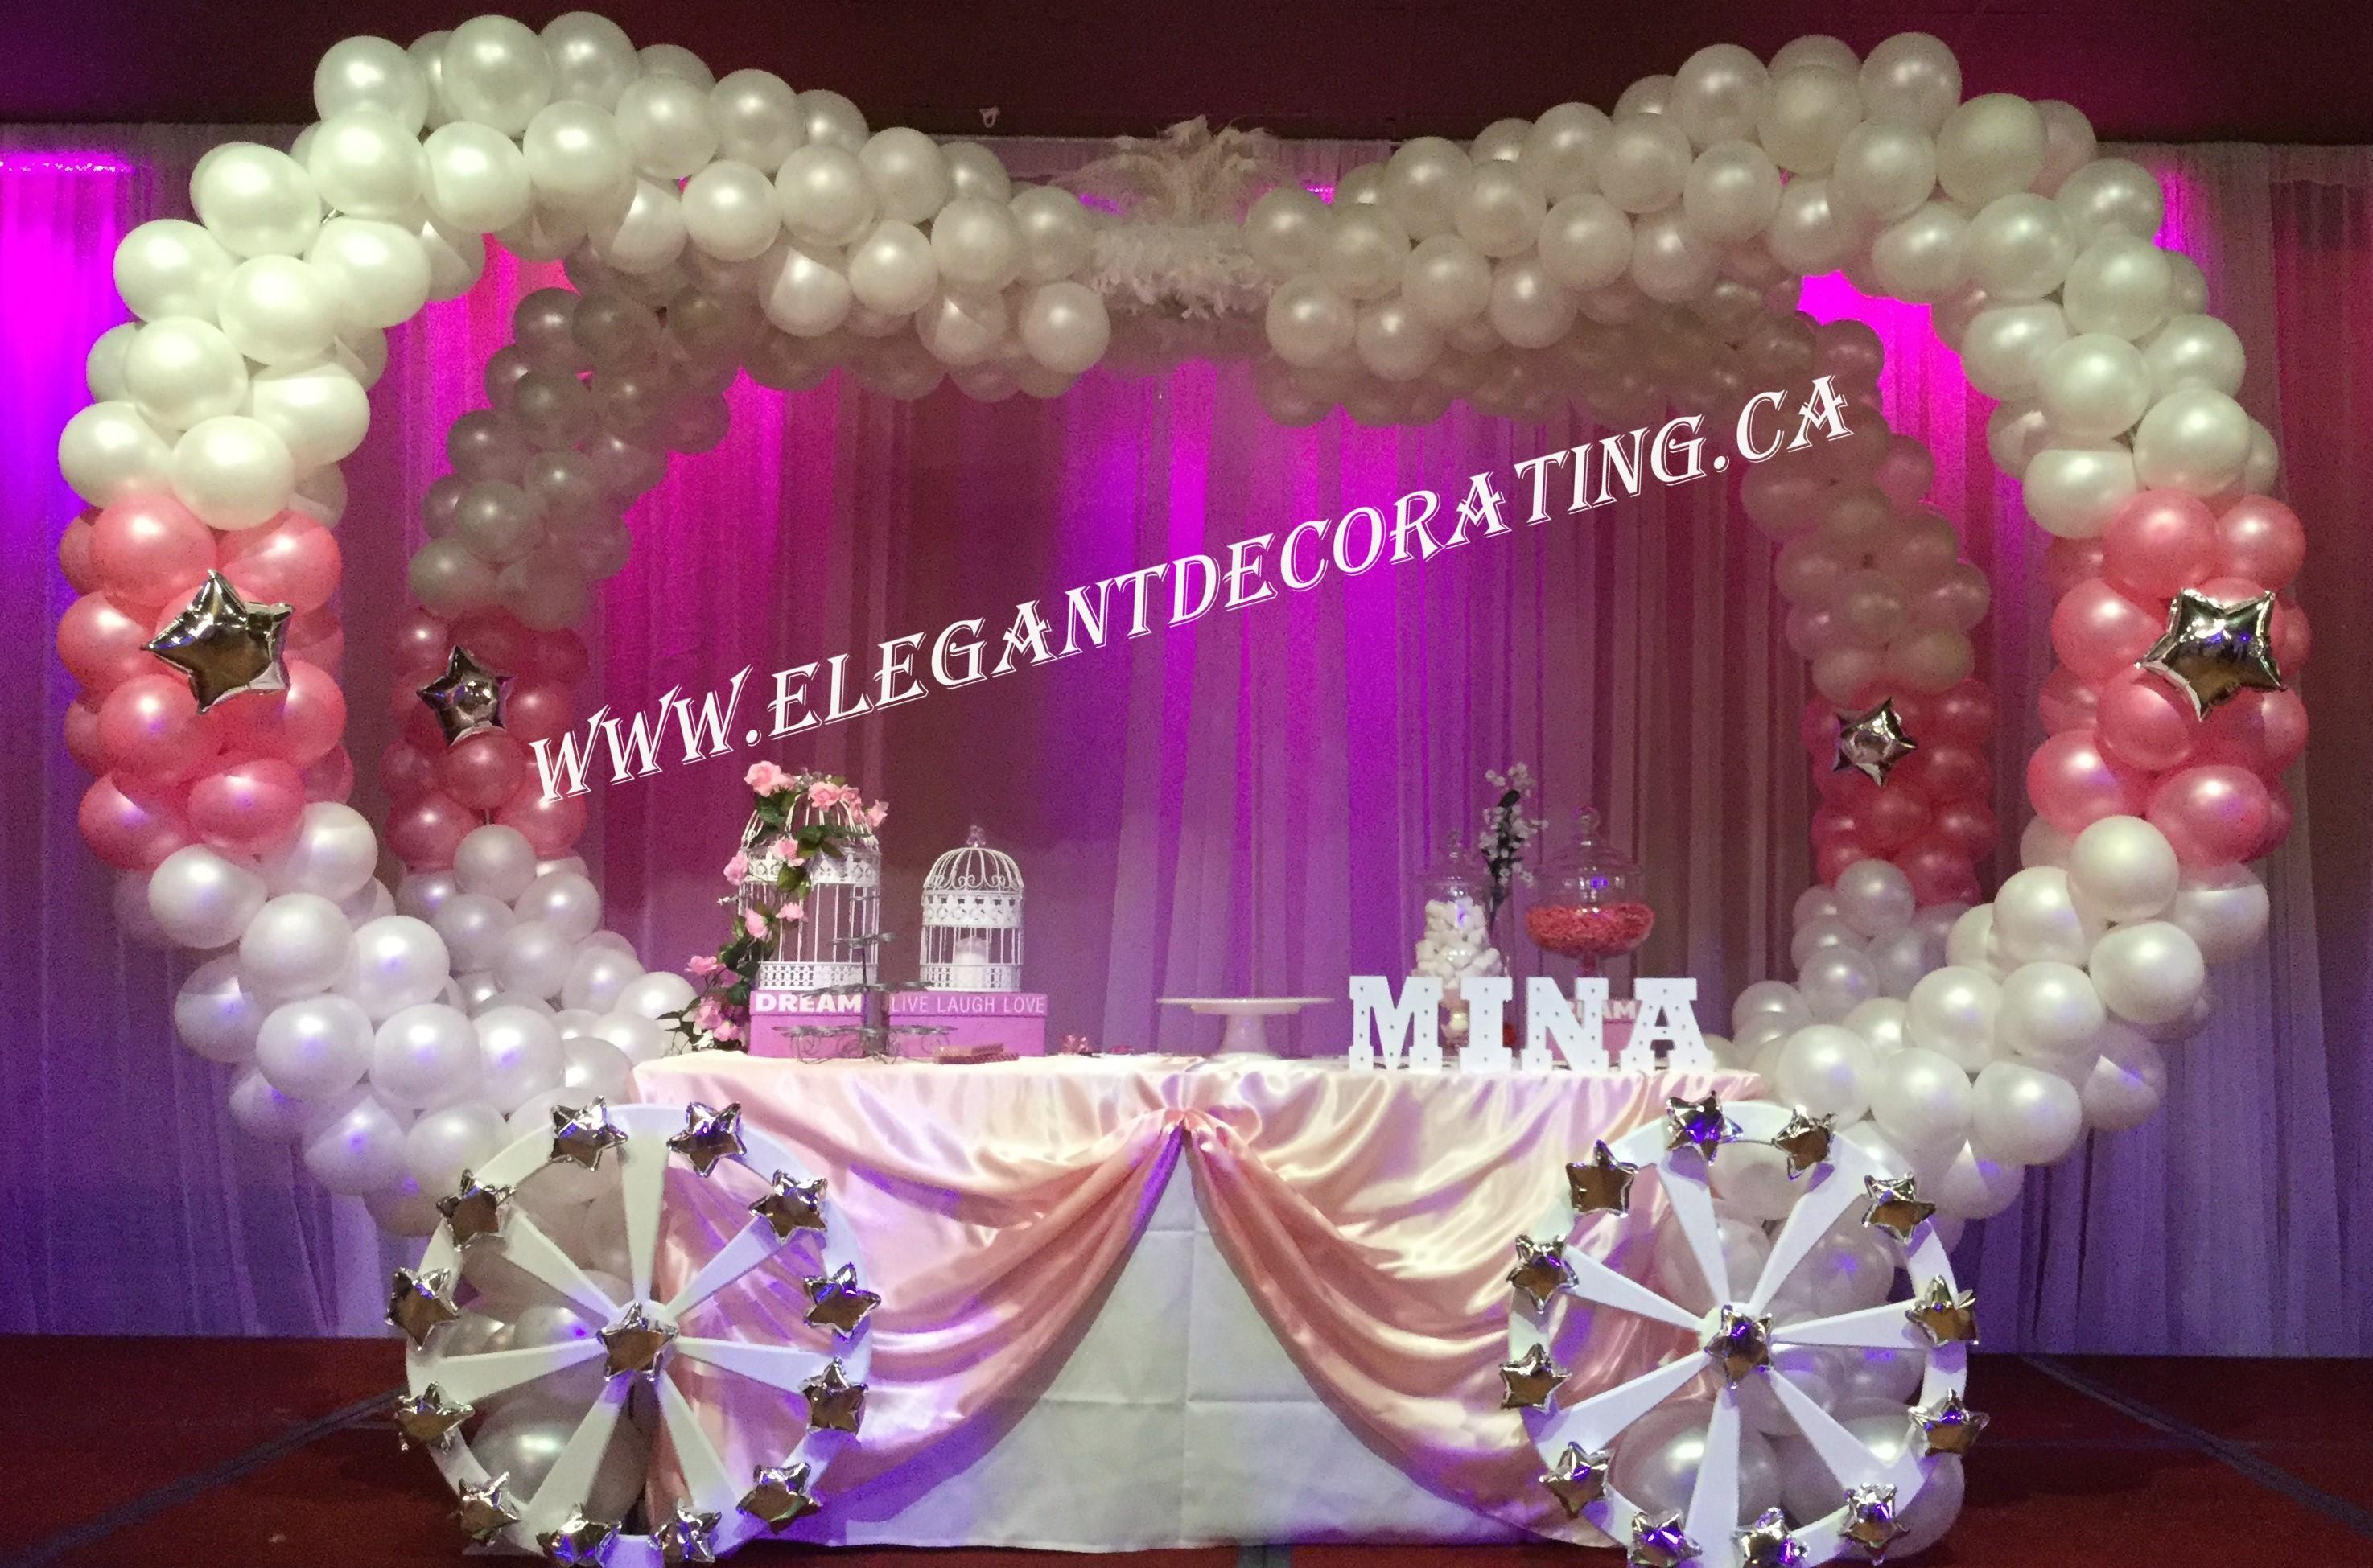 First Birthday Balloon Princess Carriage Decor Ideas Edmonton Events Wedding Rentals